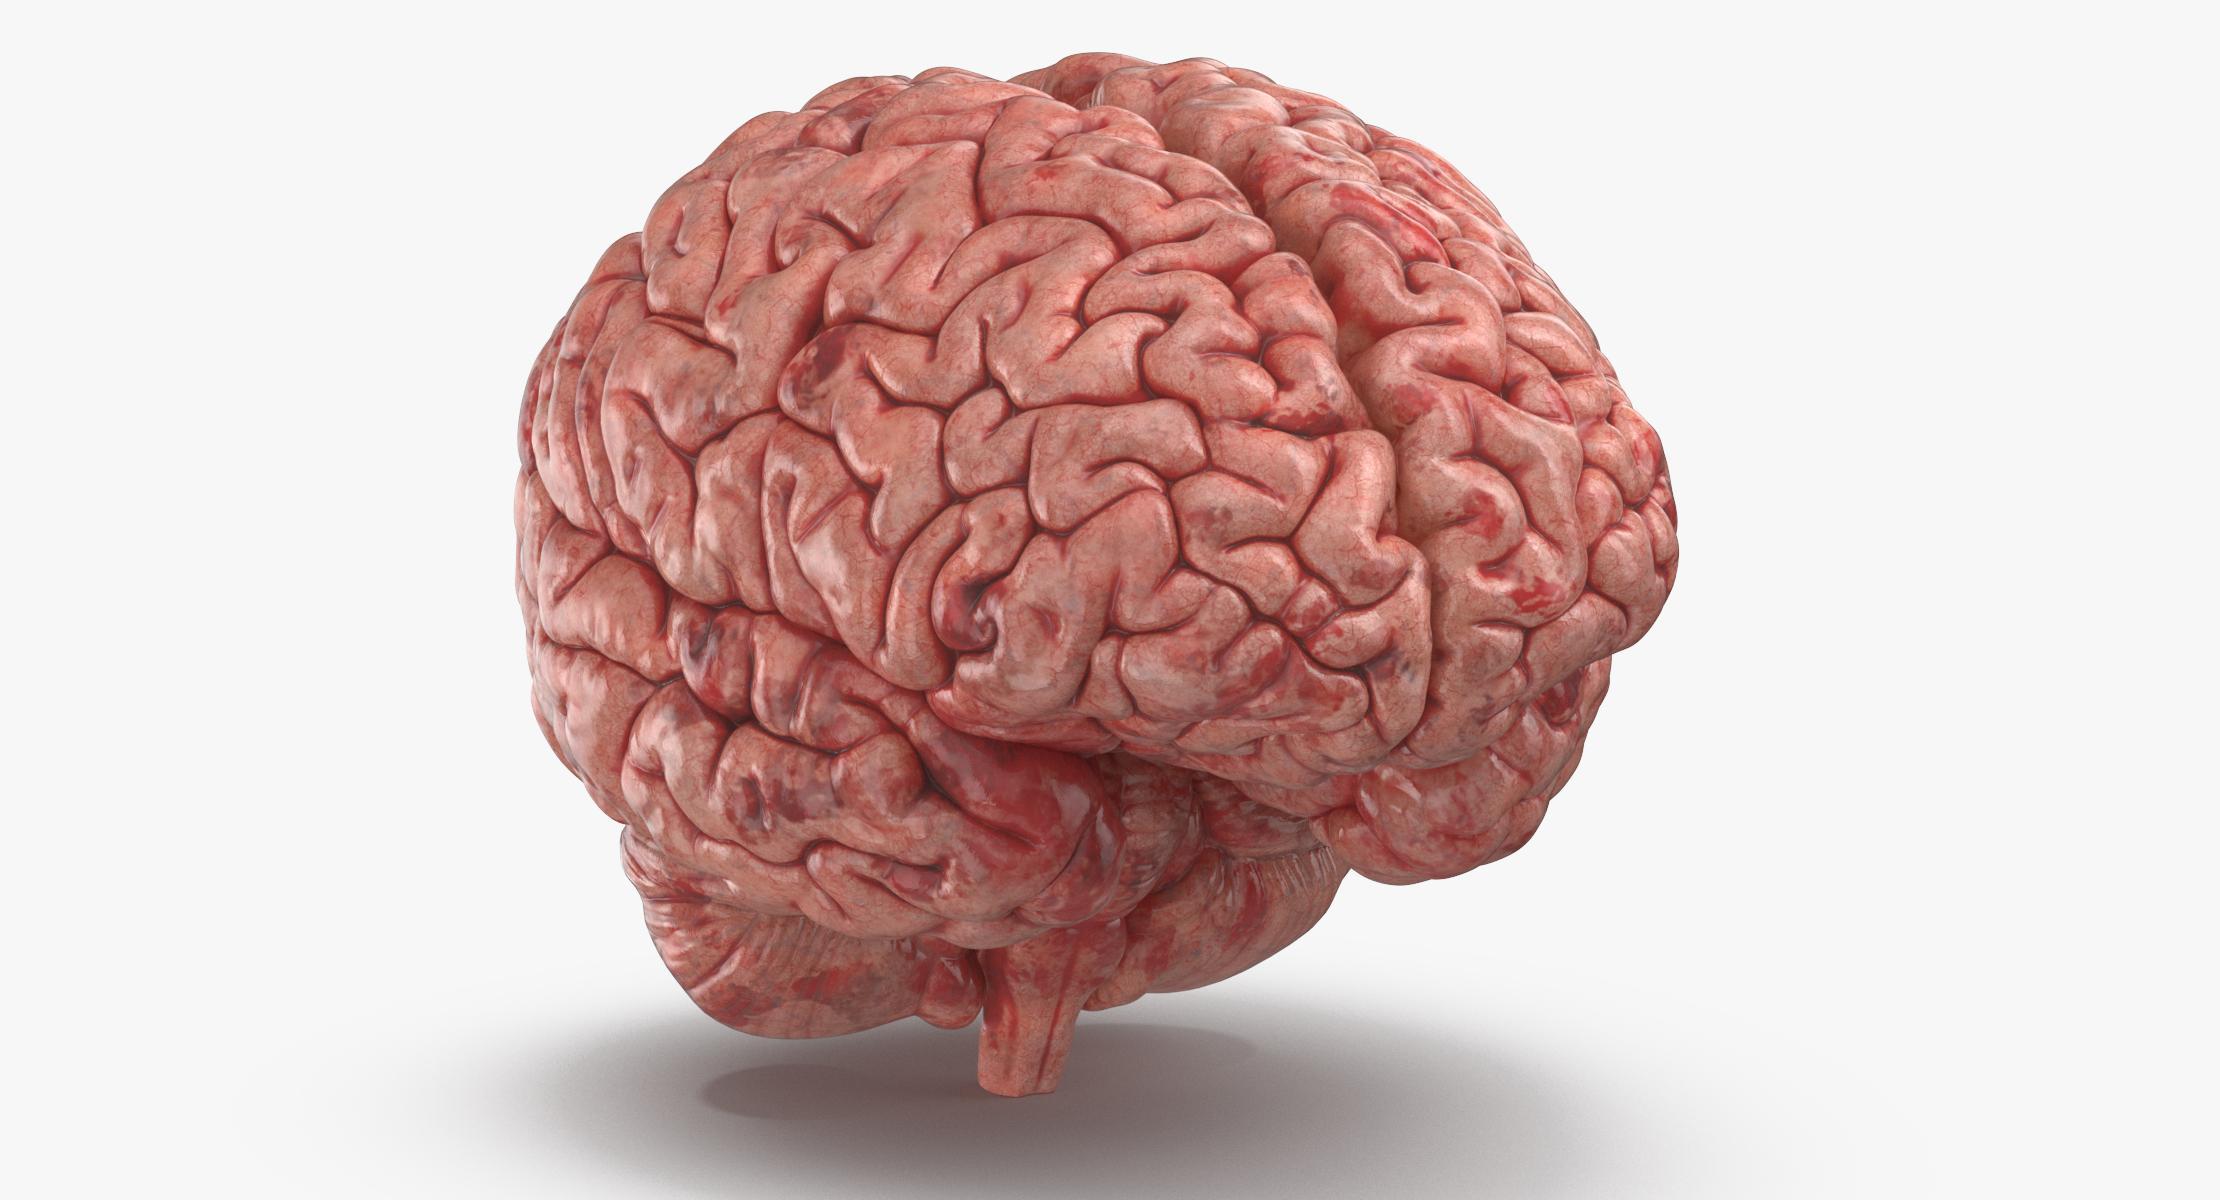 Human Brain - reel 1